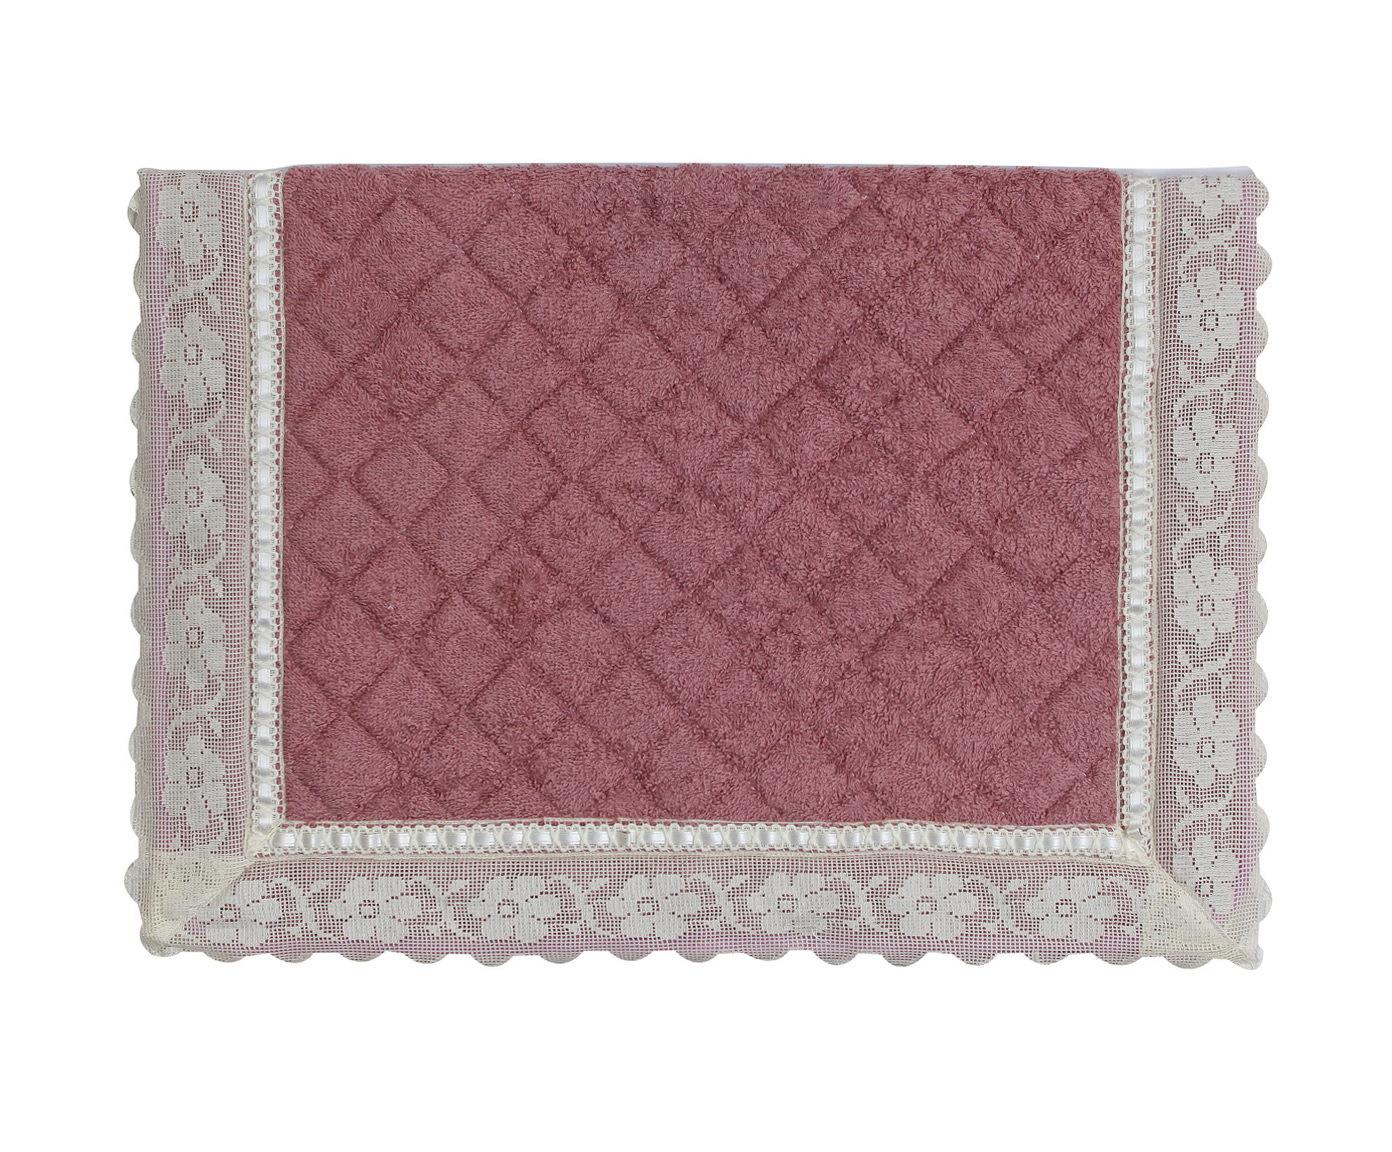 Коврики для ванной Коврик для ванной 50х70 Old Florence Buratto розовый kovrik-dlya-vannoy-buratto-ot-old-florence-italiya-tsvet-rozovyy.jpg